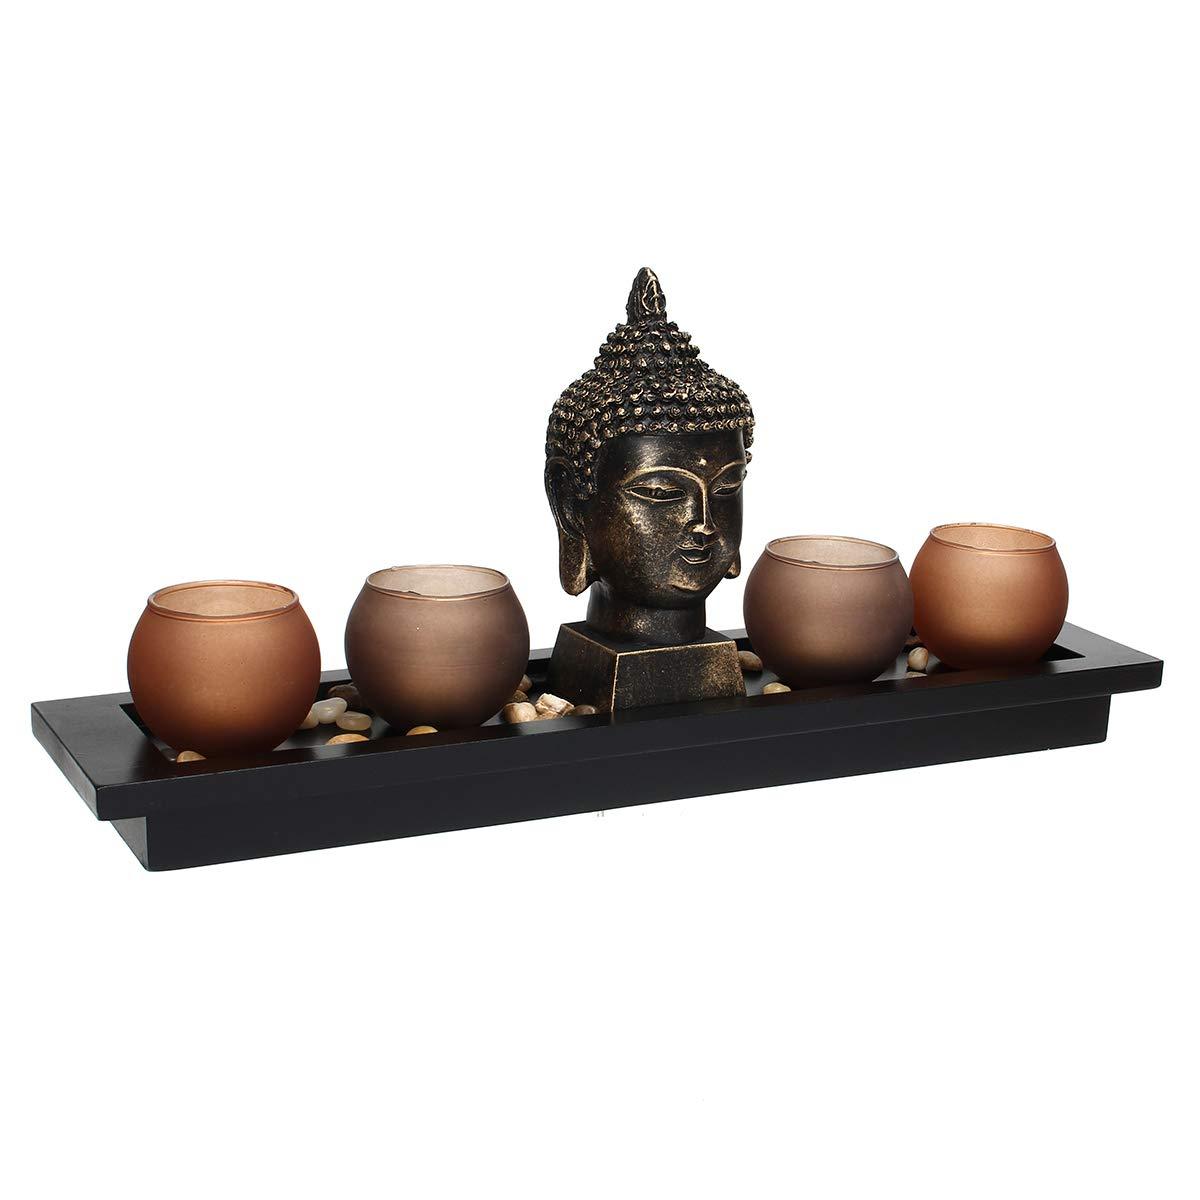 Jeteven Portavelas Portavelas de Incienso Estatua de Buda Negro Hecho de Resina Soporte de Velas Decorativas Zen Buddha